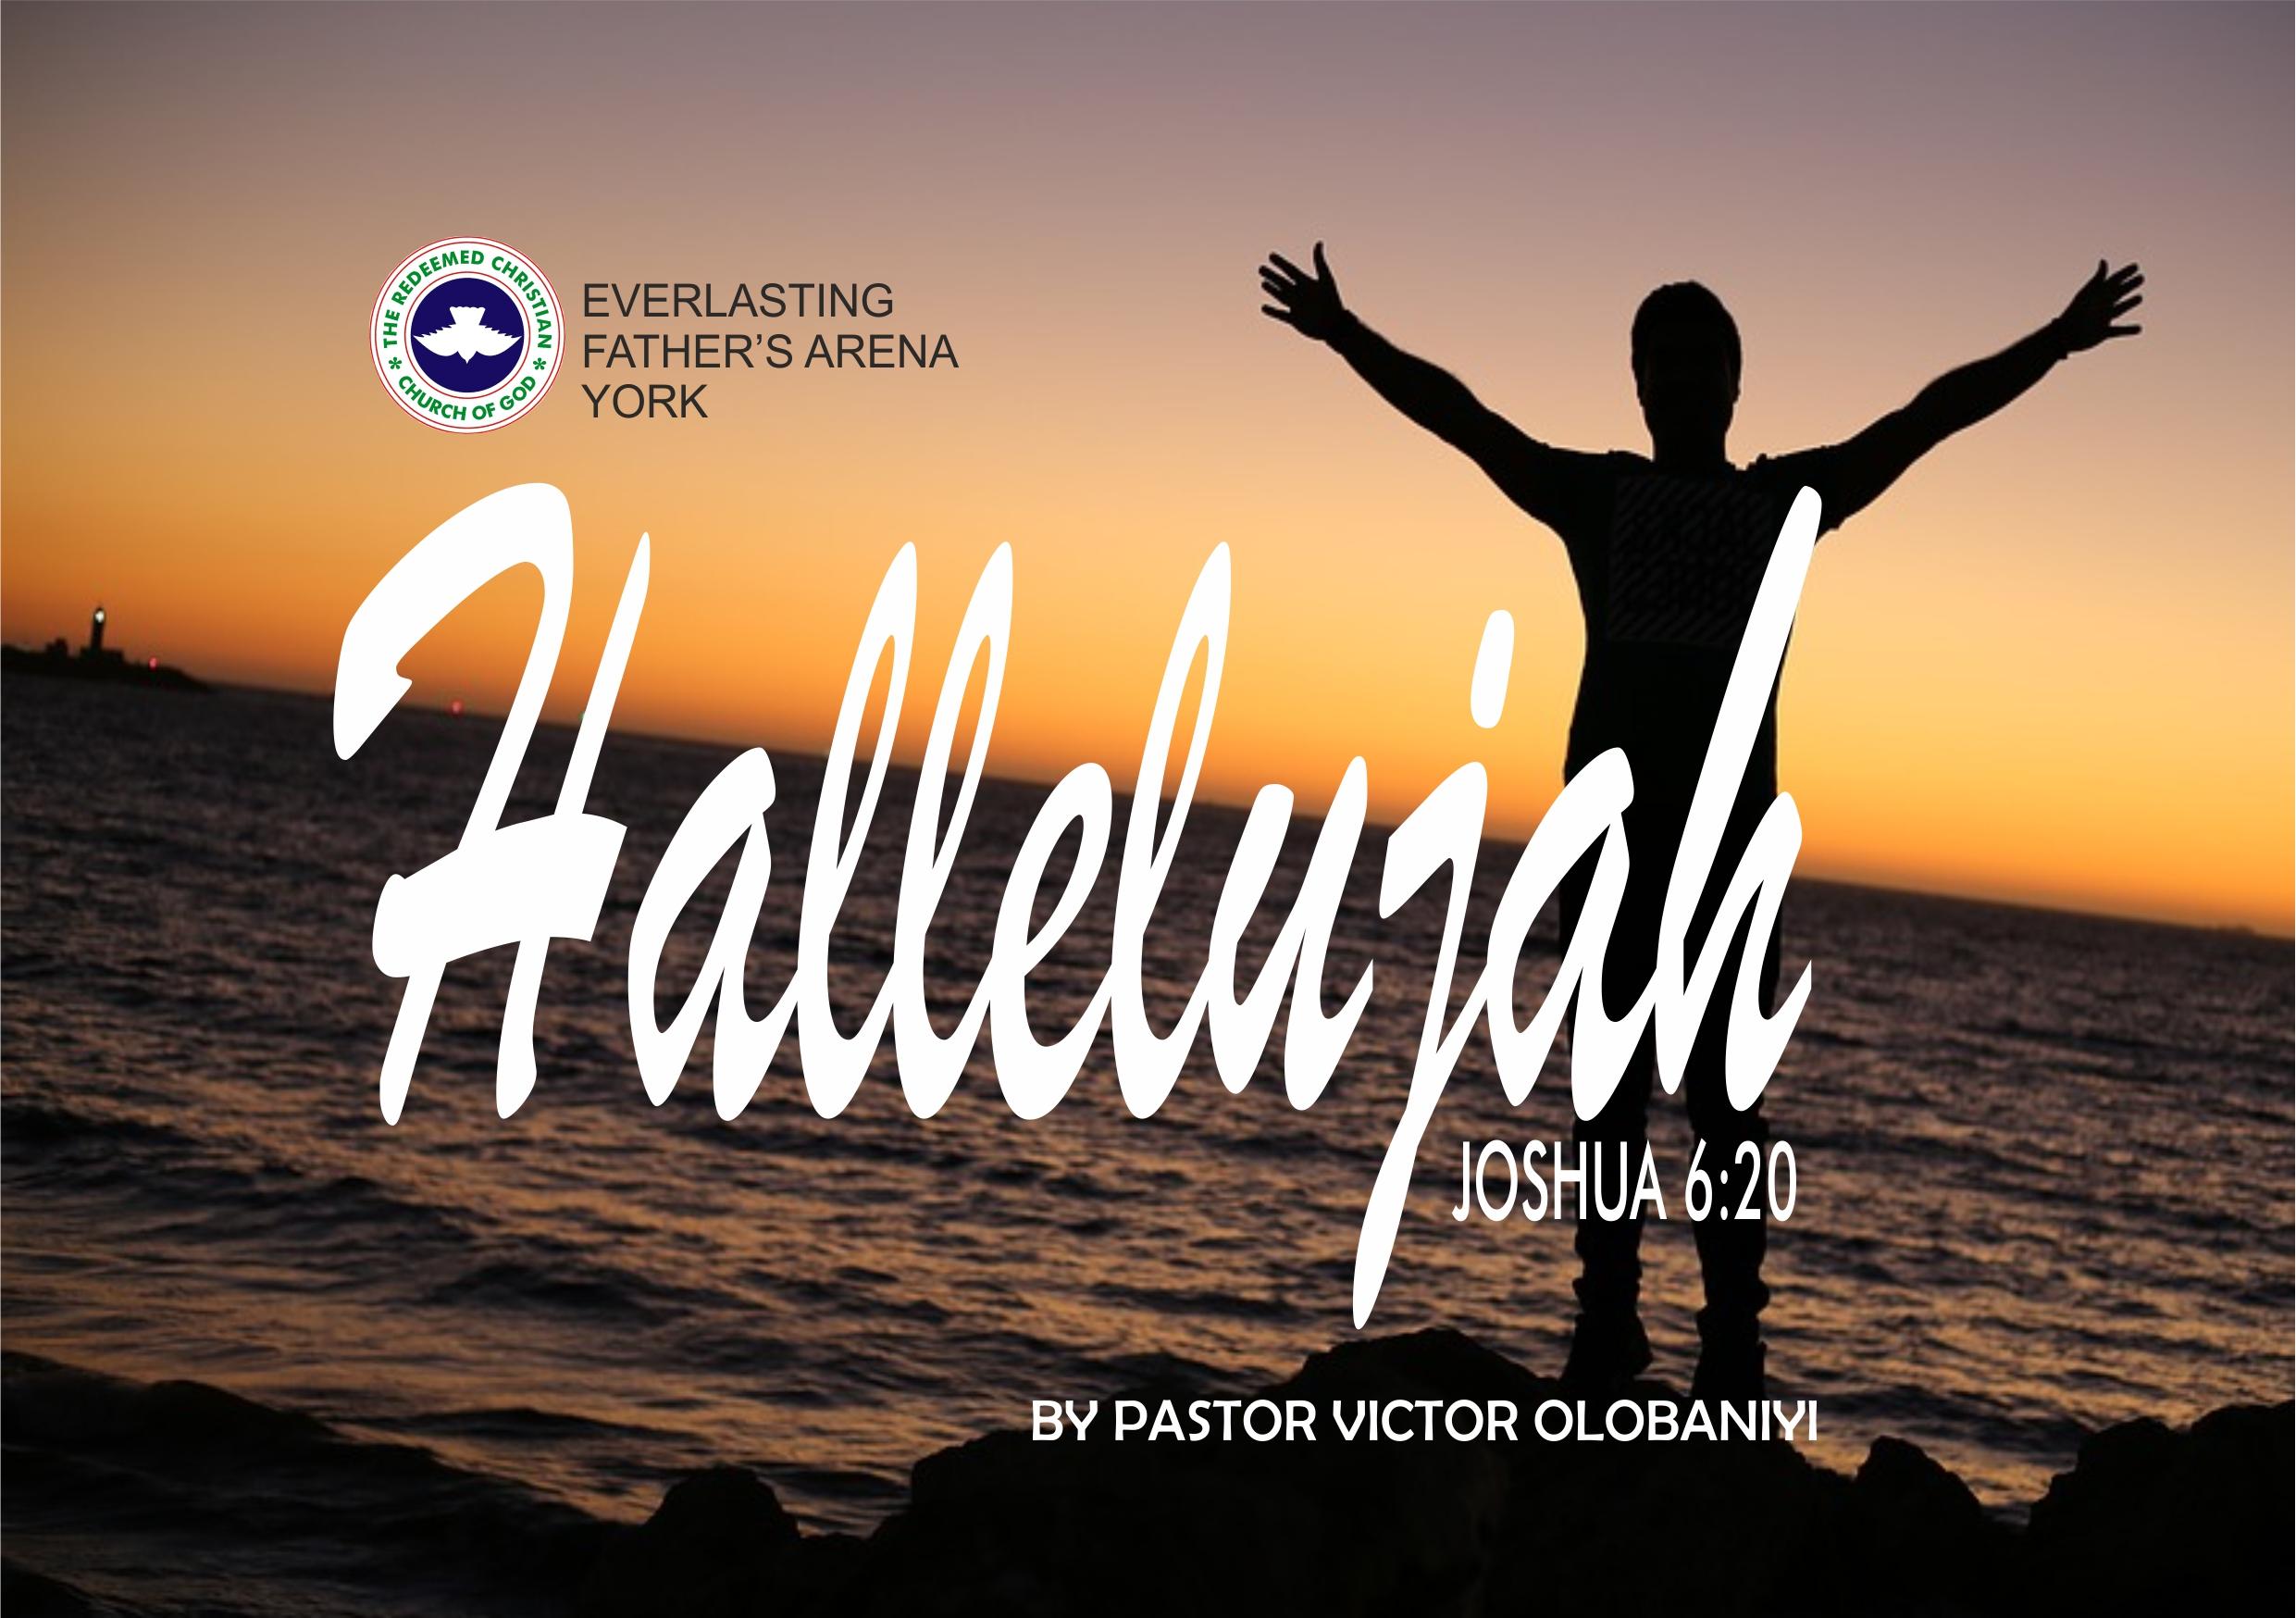 Hallelujah!, by Pastor Victor Olobaniyi